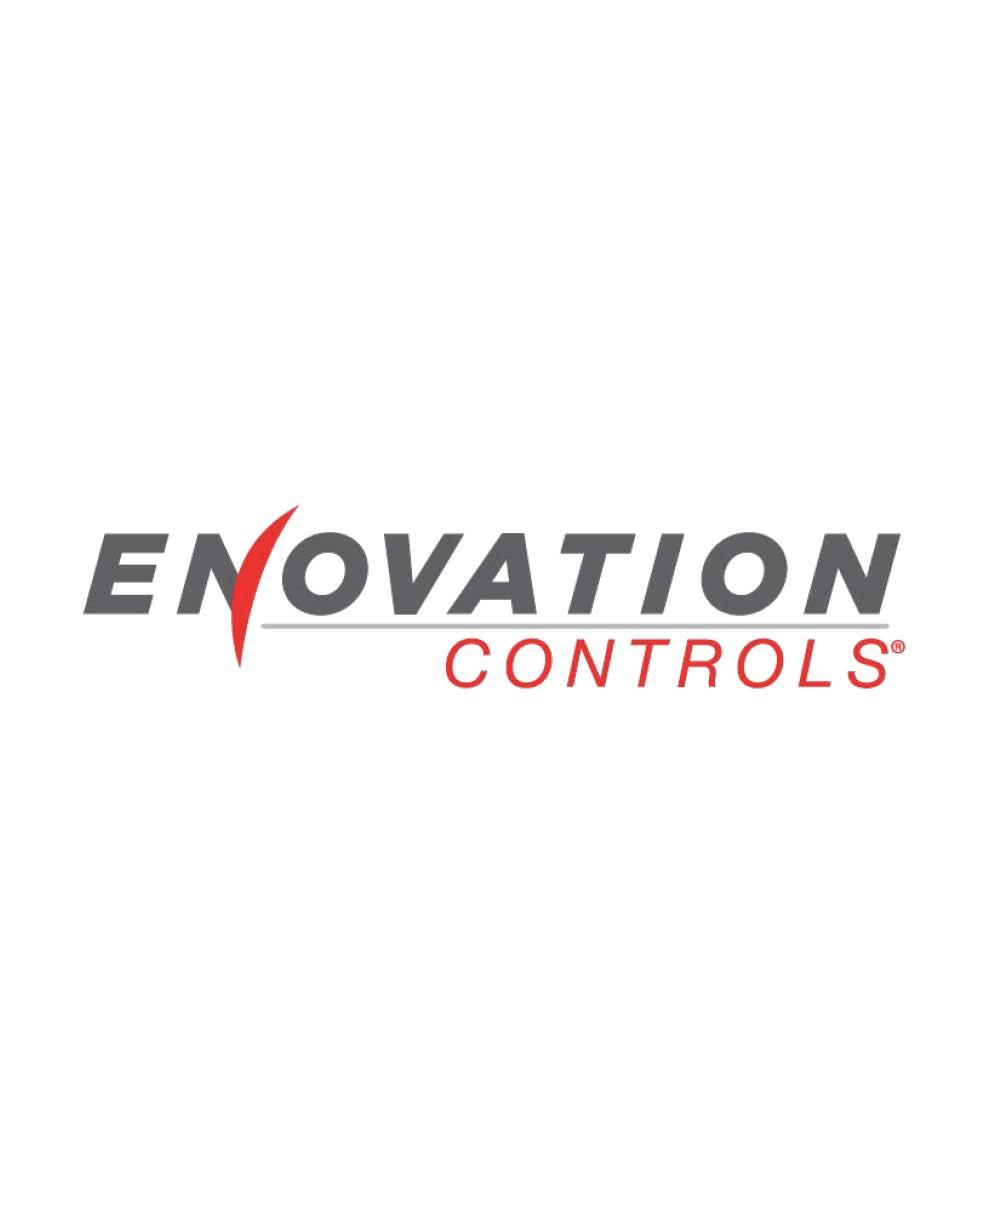 Enovation Controls Logo .jpg